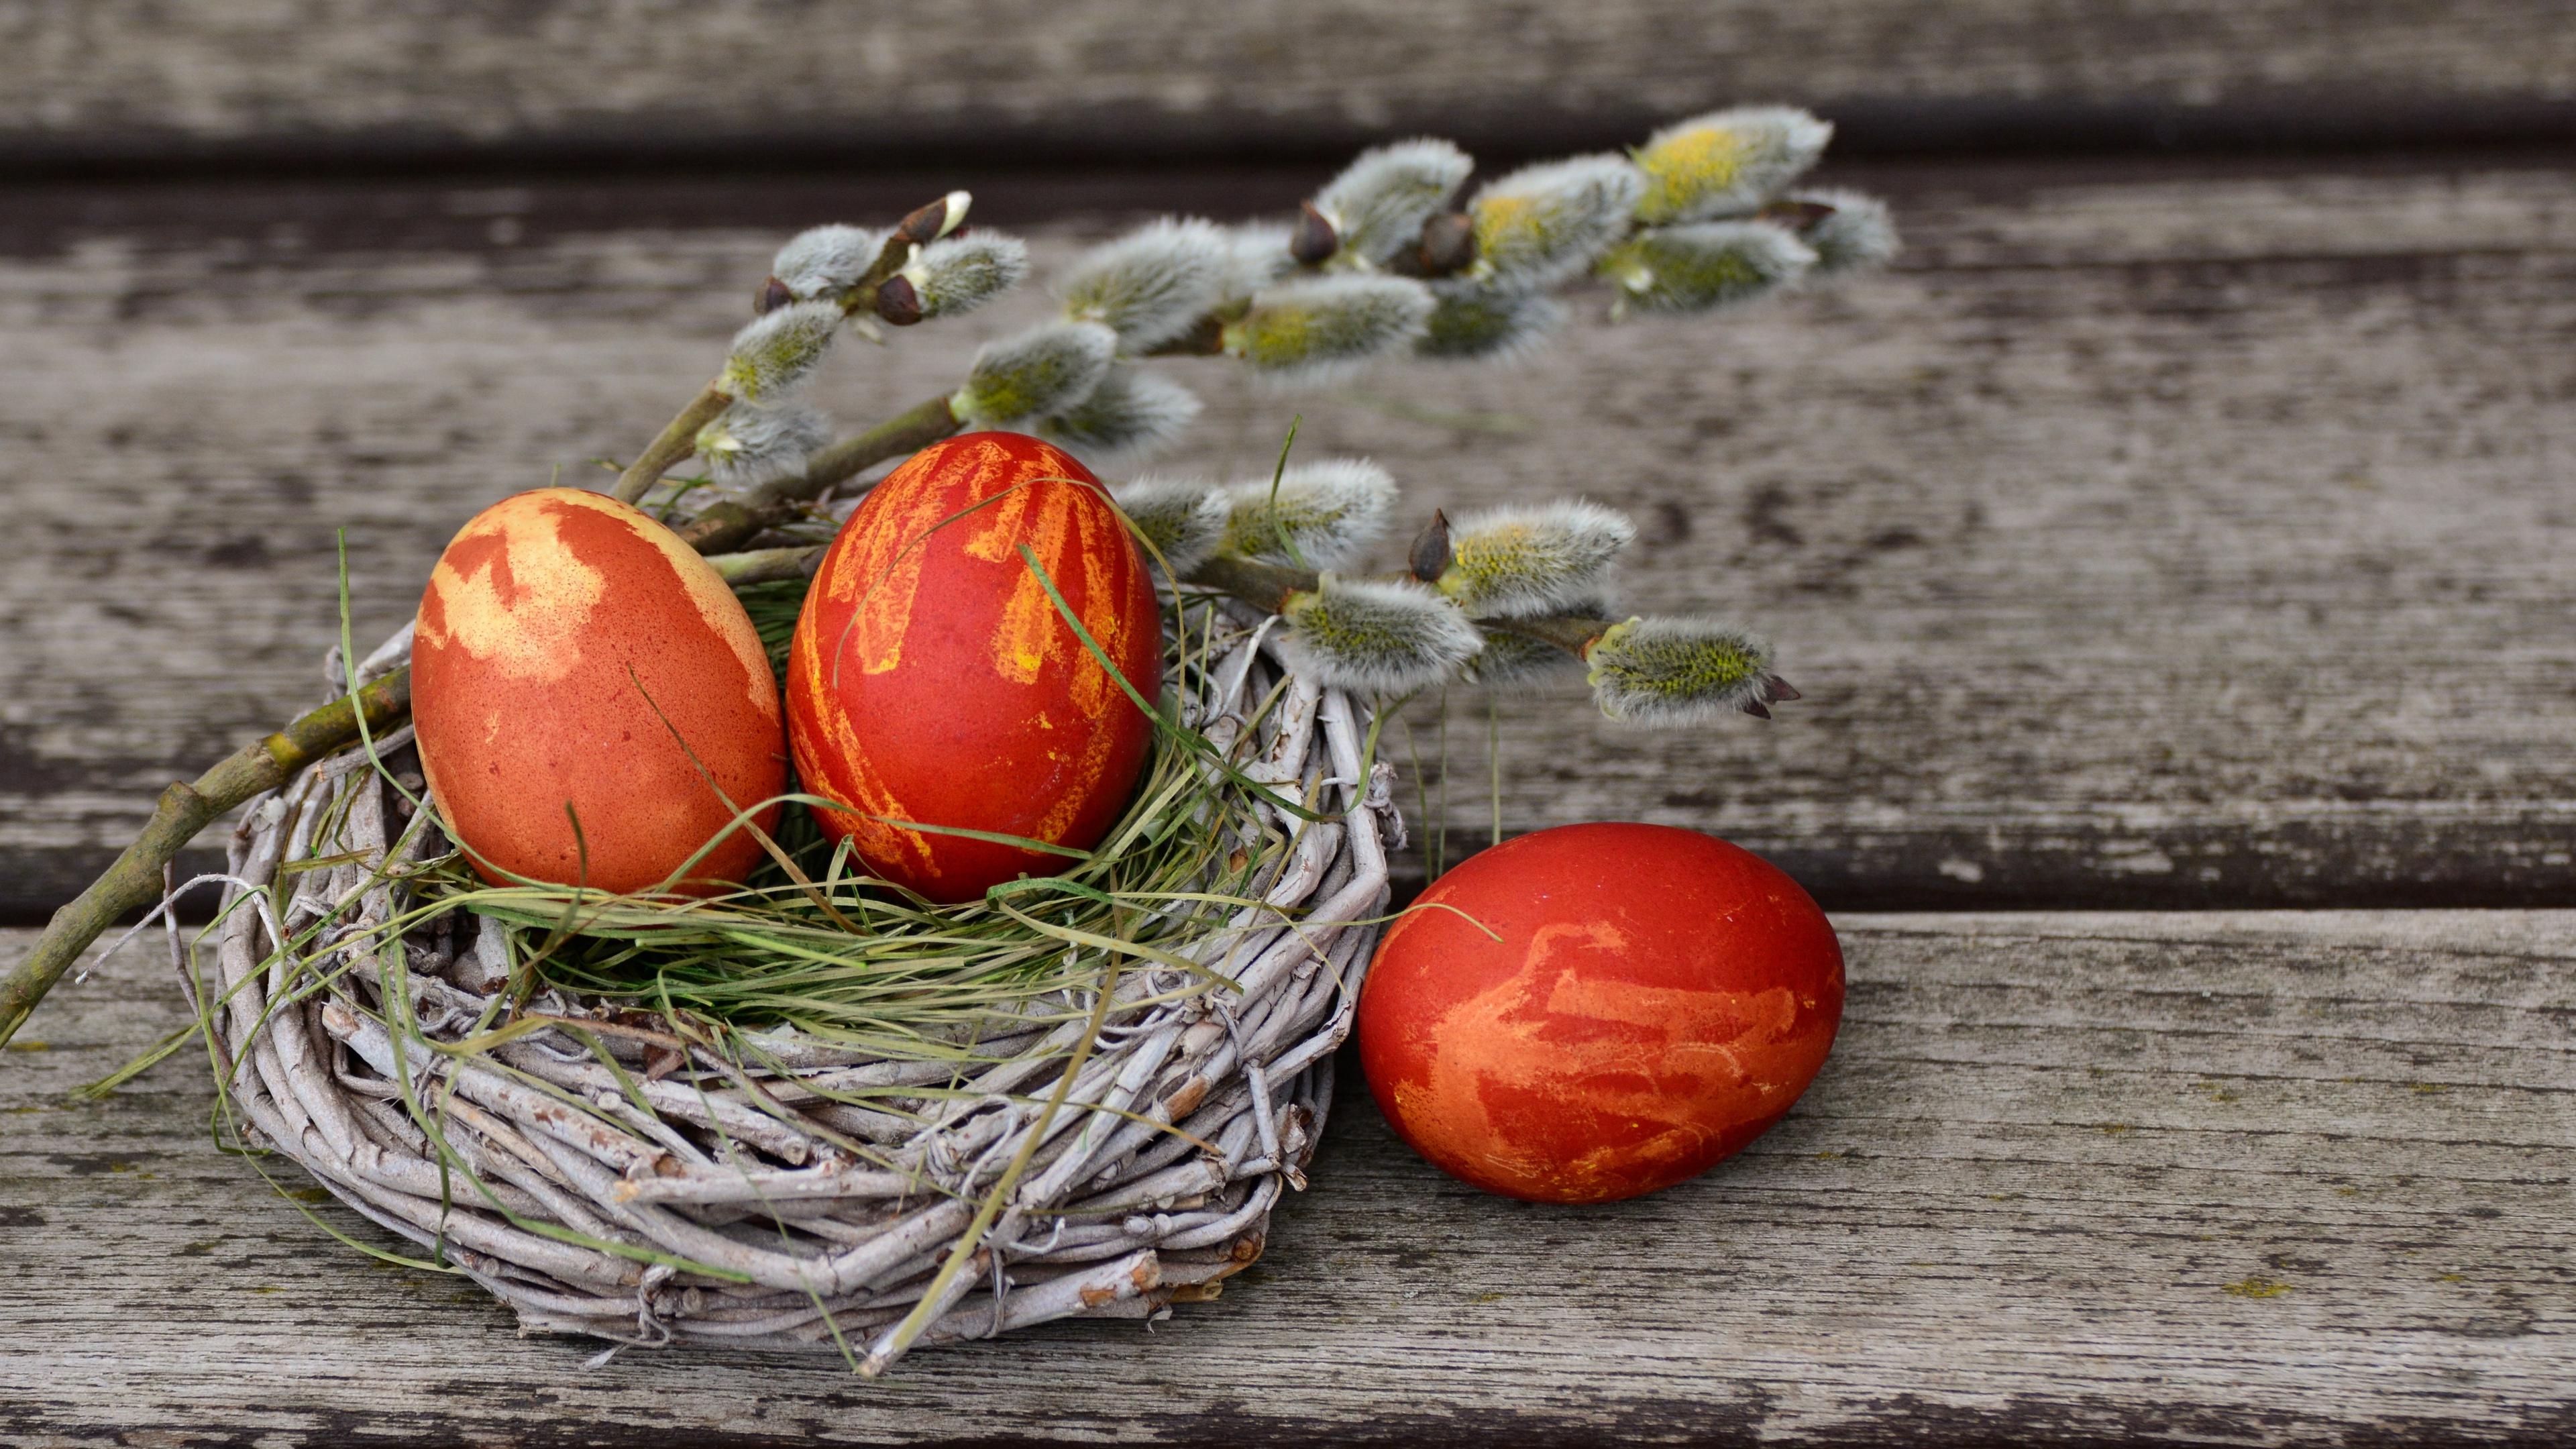 eggs easter willow decorating 4k 1538344634 - eggs, easter, willow, decorating 4k - willow, Eggs, Easter